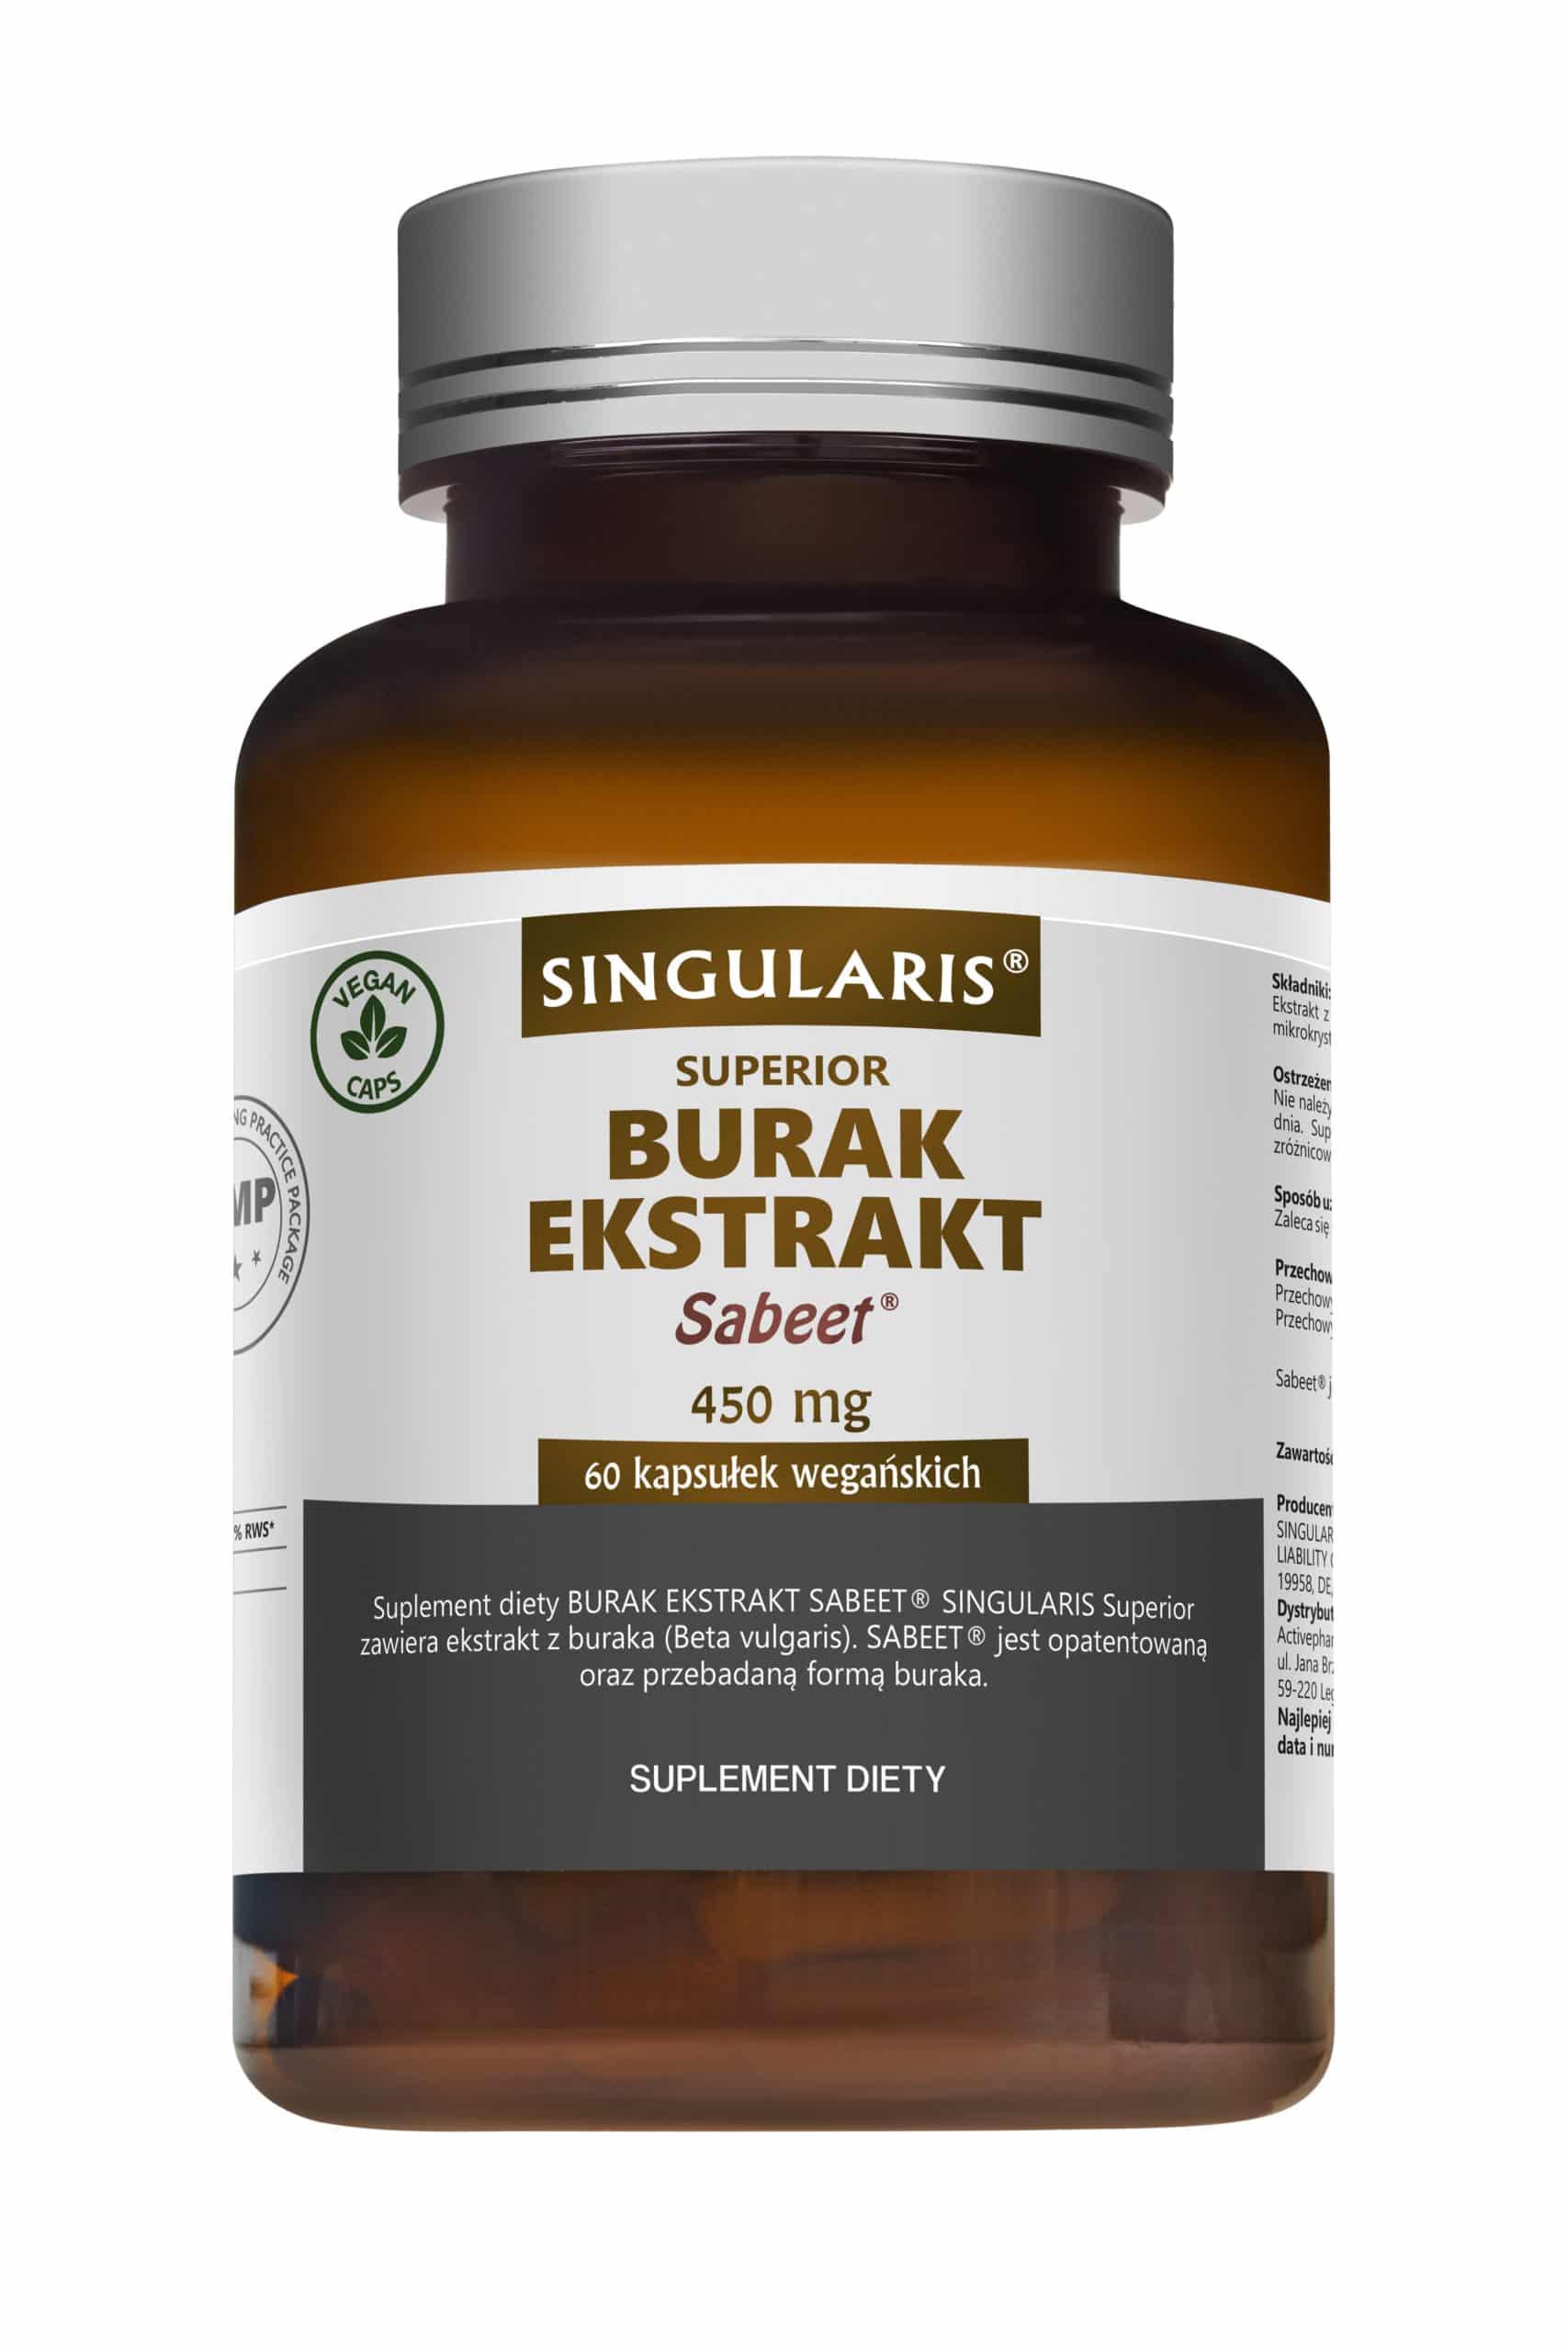 BURAK EKSTRAKT SABEET® 450 mg SINGULARIS® SUPERIOR - 60 kapsułek wegańskich